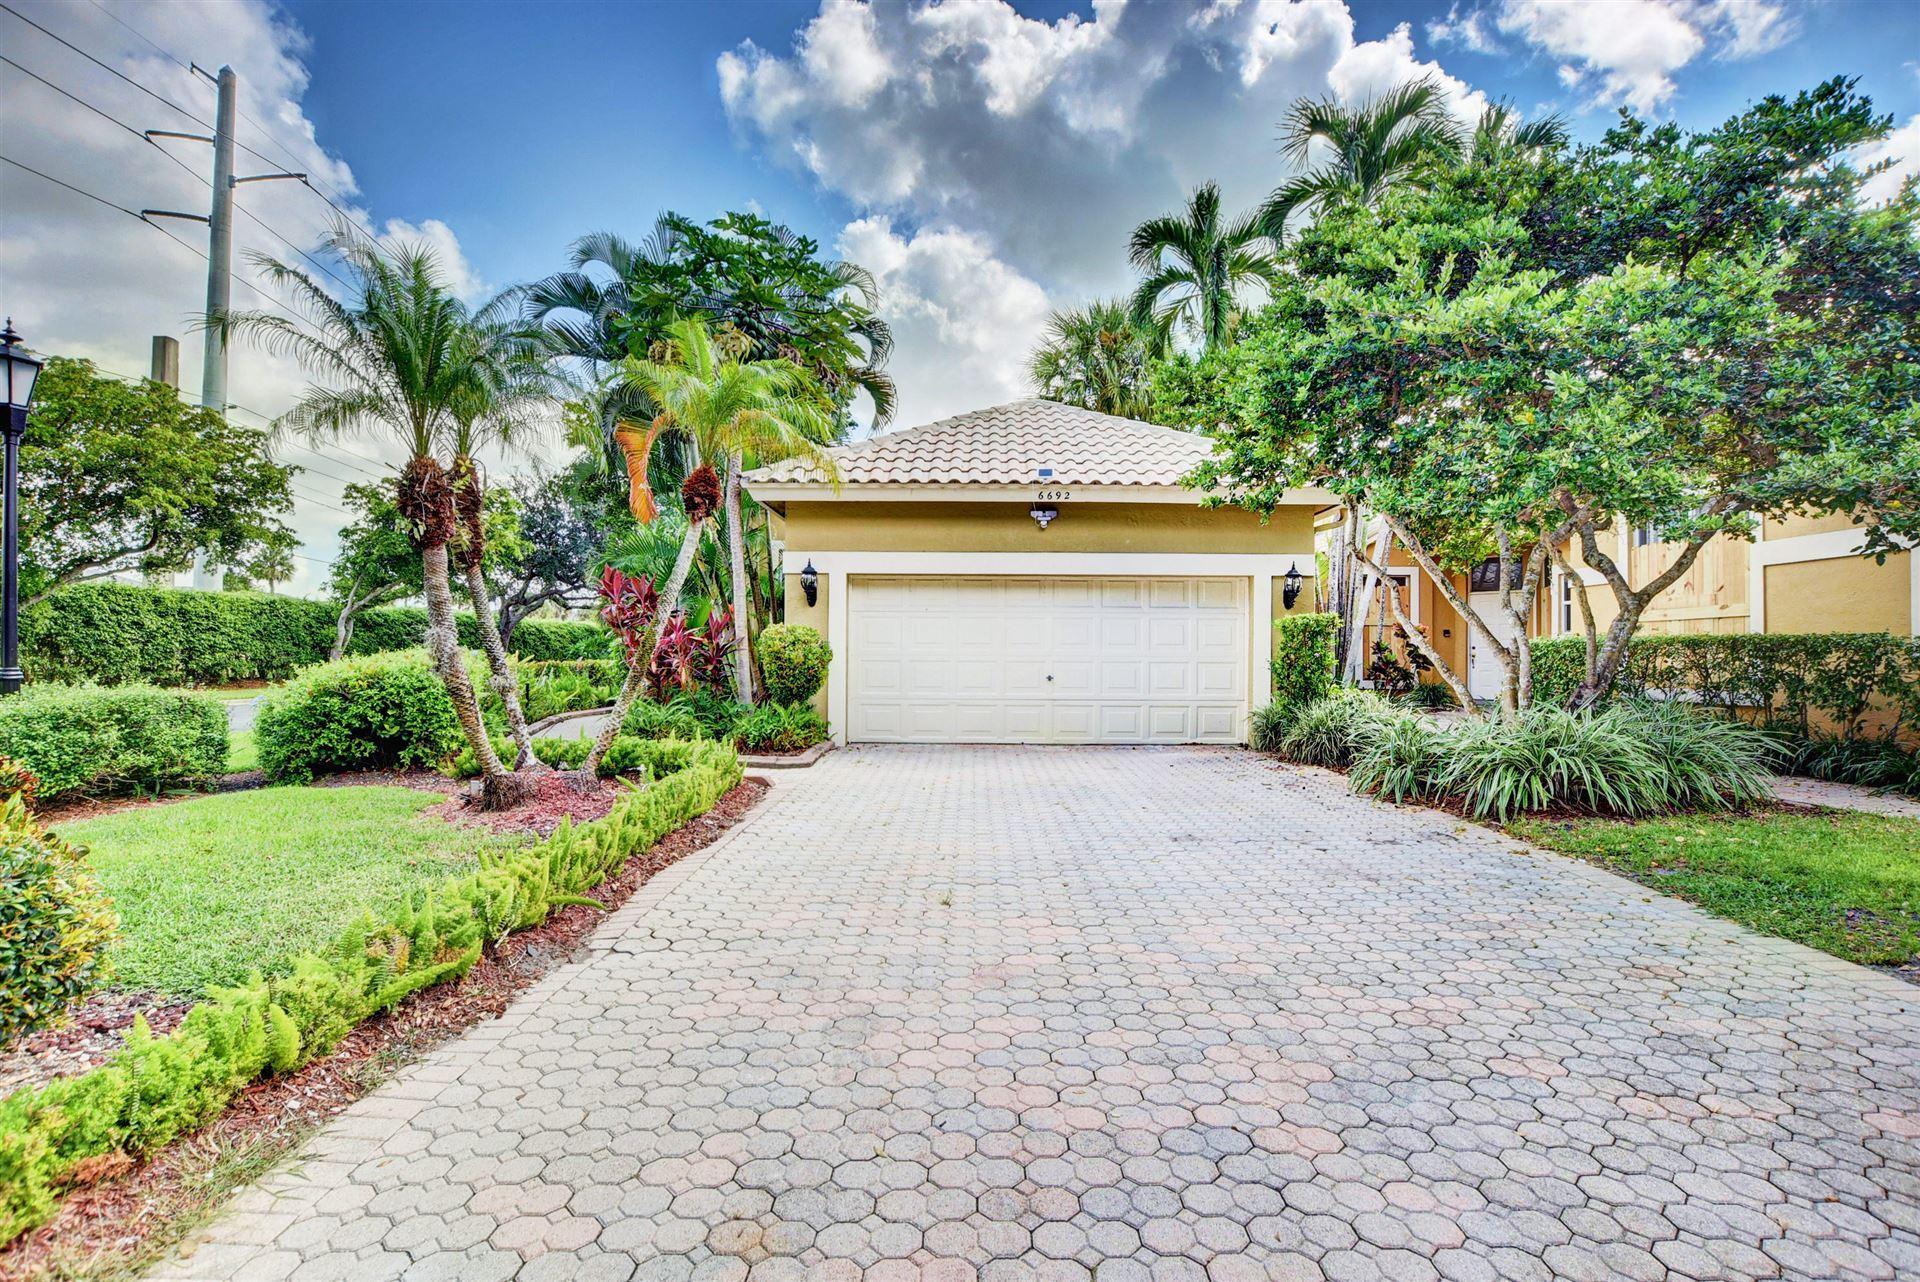 6692 NW 27th Avenue, Boca Raton, FL 33496 - MLS#: RX-10753083